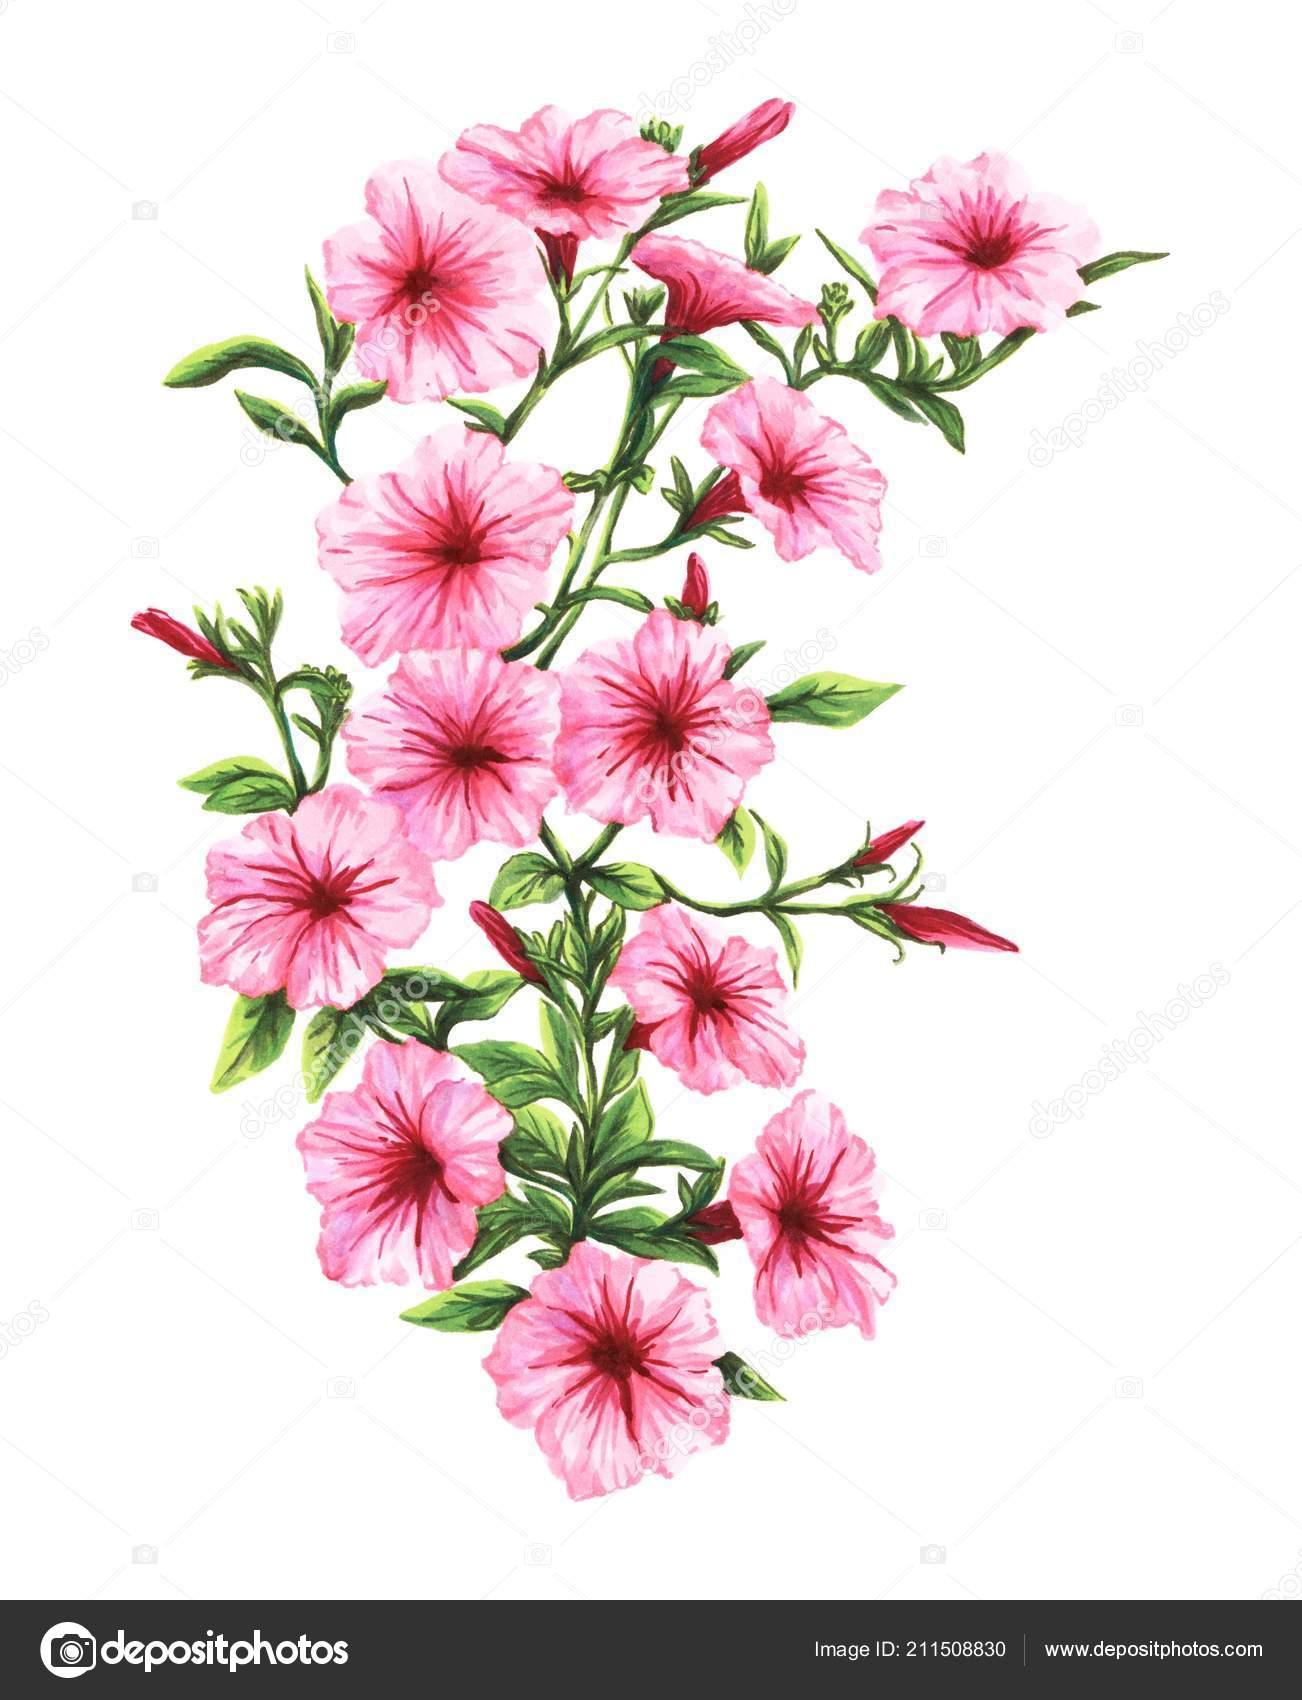 Dibujo A Mano Flores Petunia Marcadores Rosa Foto De Stock